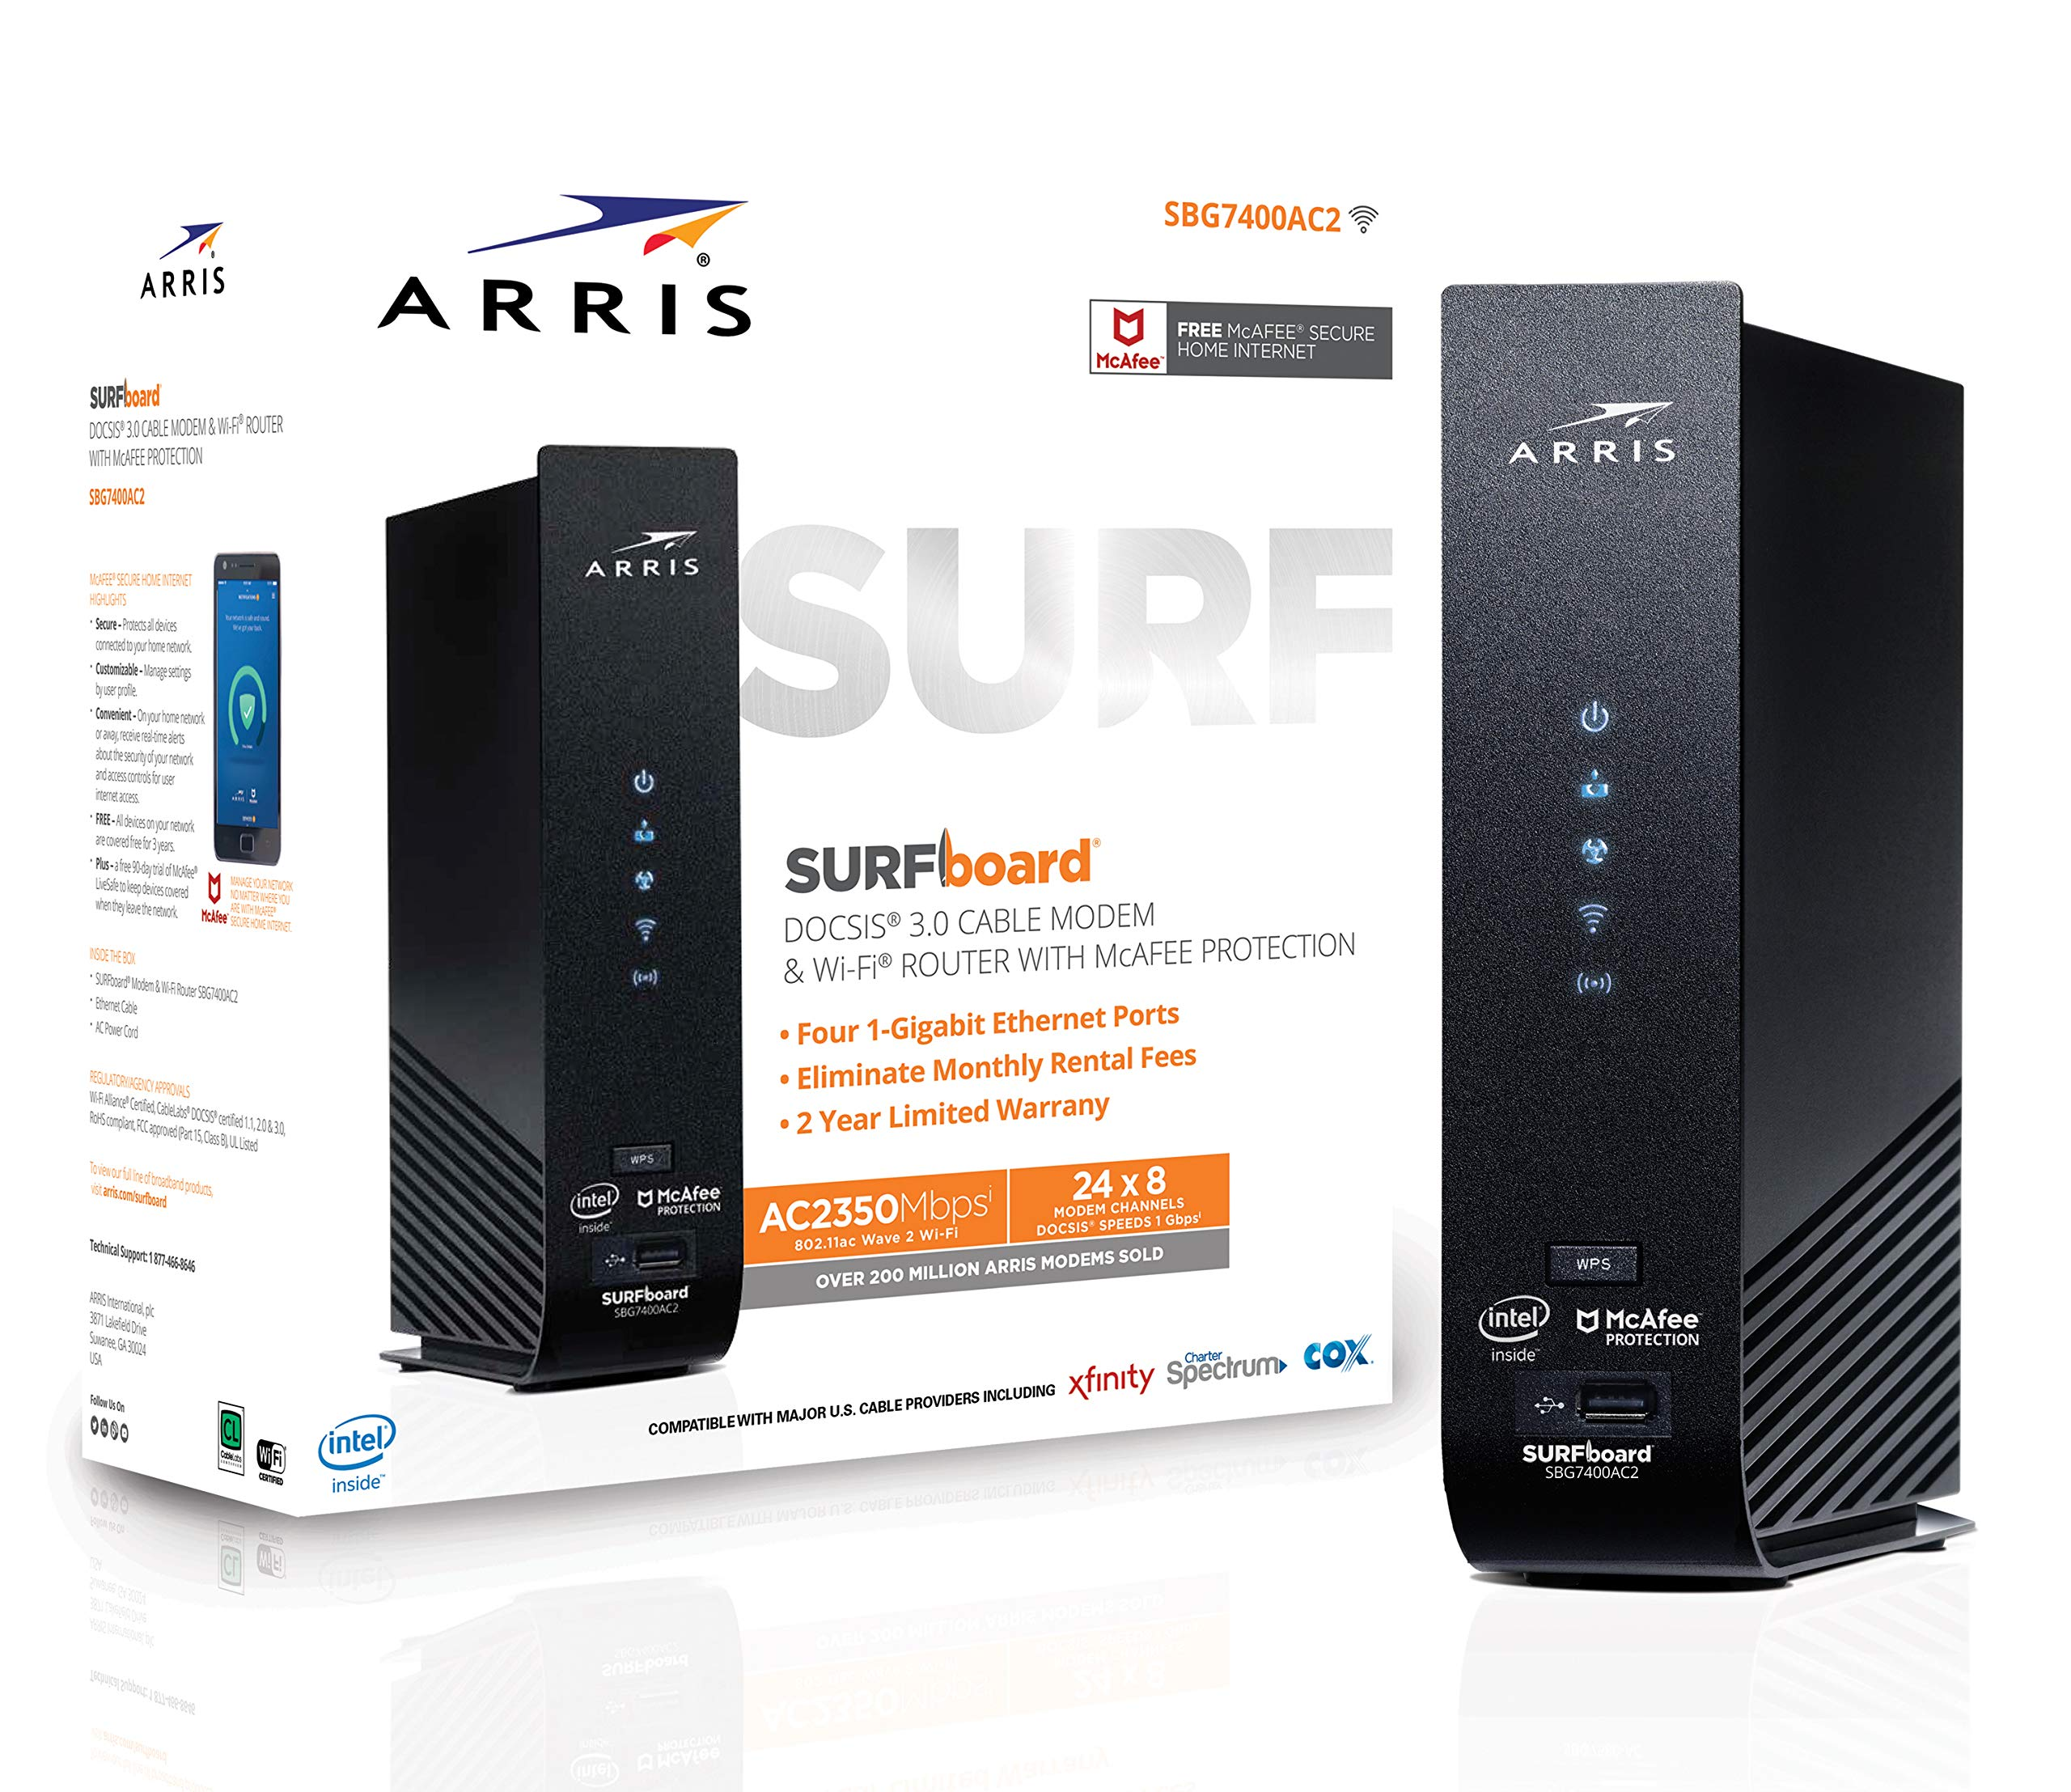 ARRIS SURFboard SBG7400AC2 Internet Protection